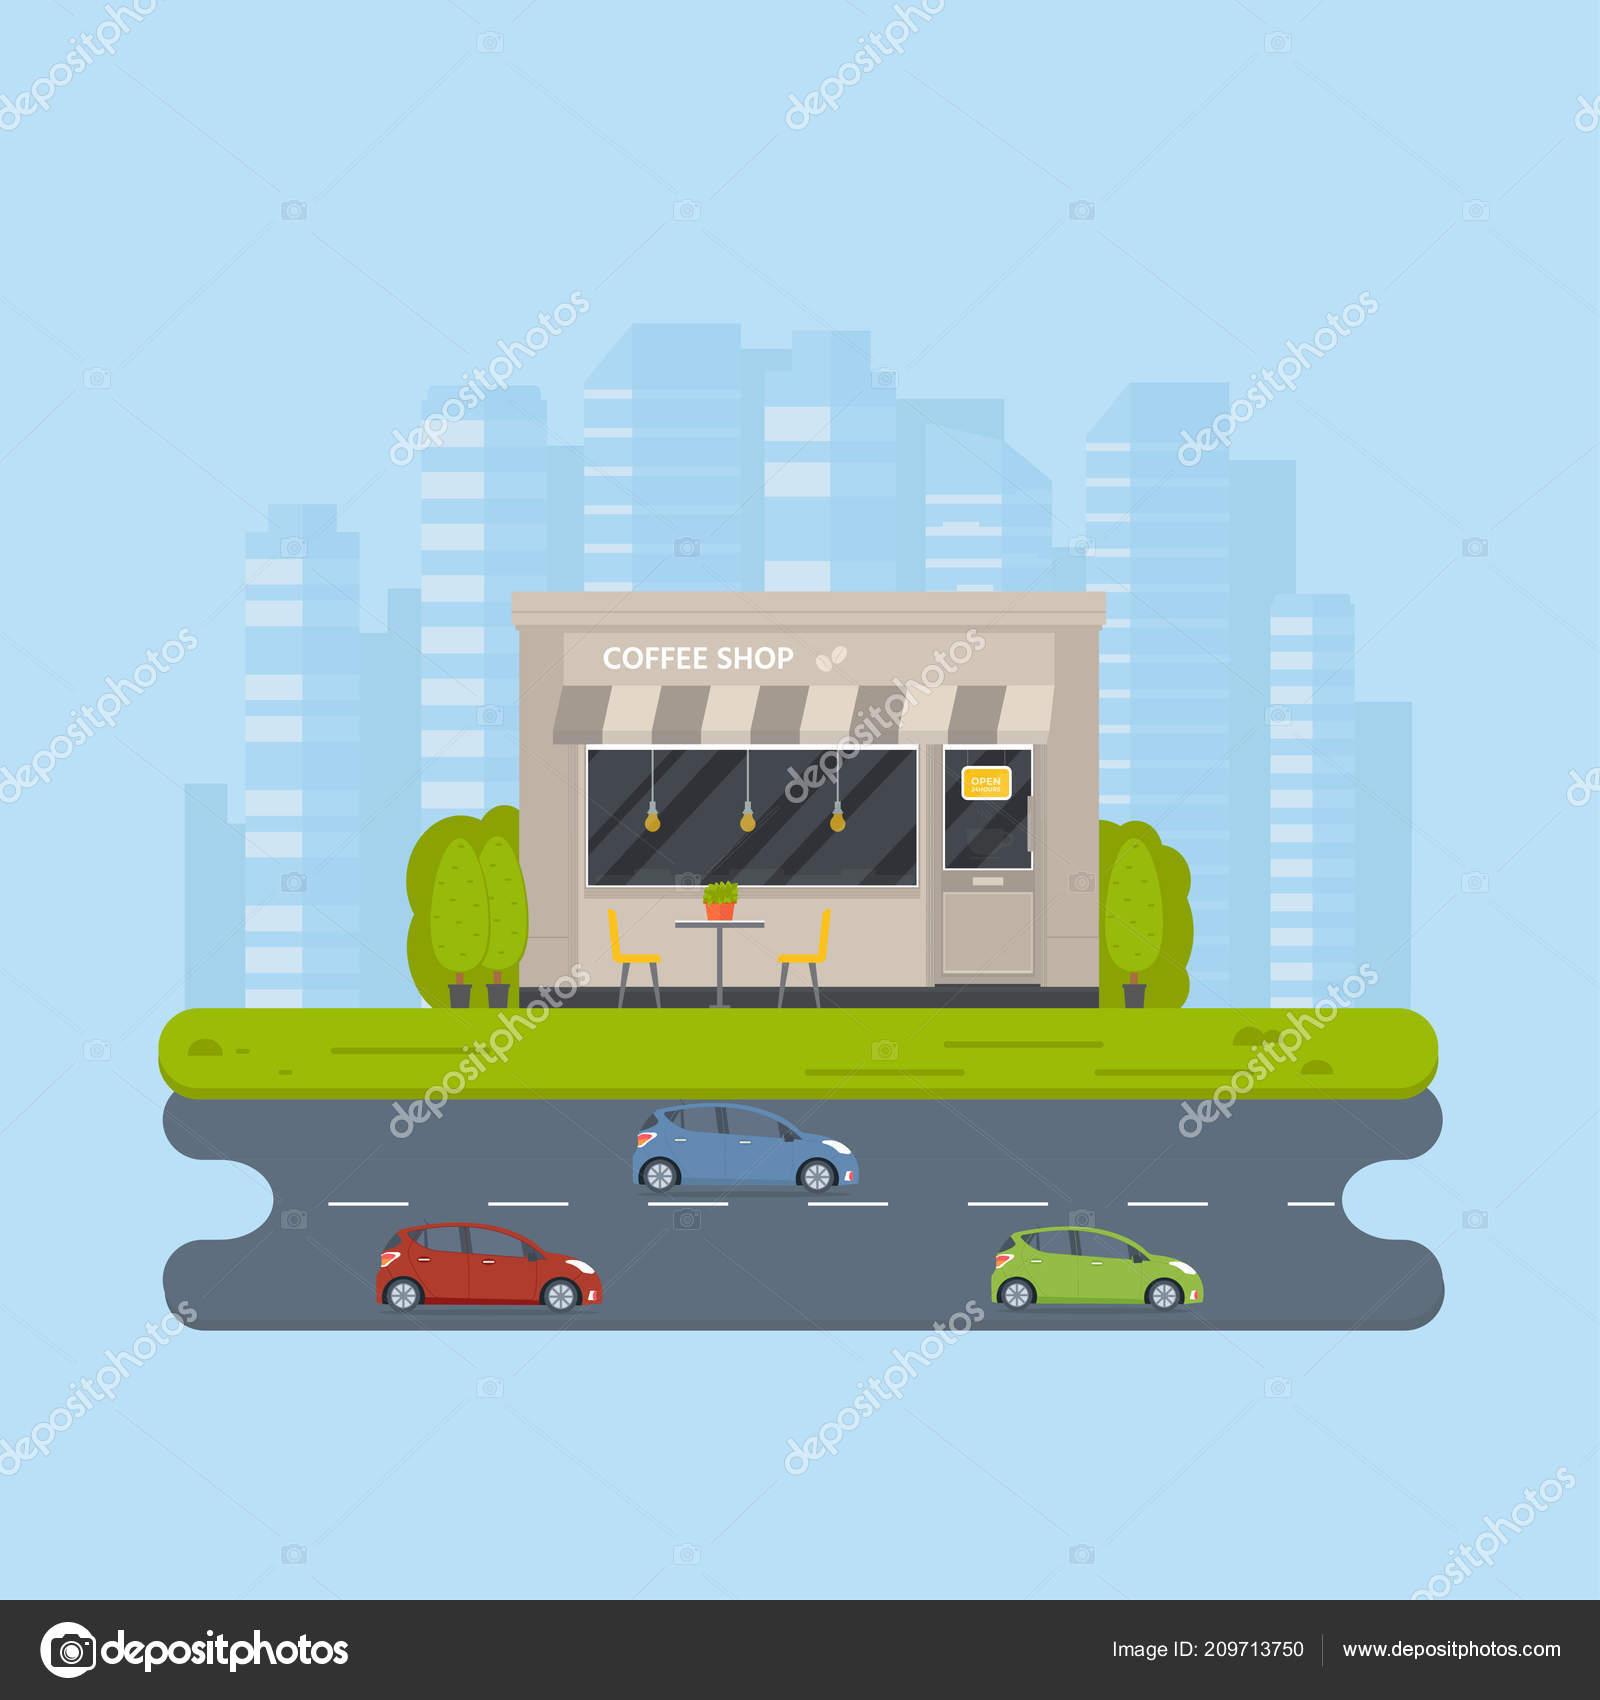 Vector Flat Design Restaurant Exterior Coffee Shops Facad Store Front Stock Vector C Tanyasun 209713750